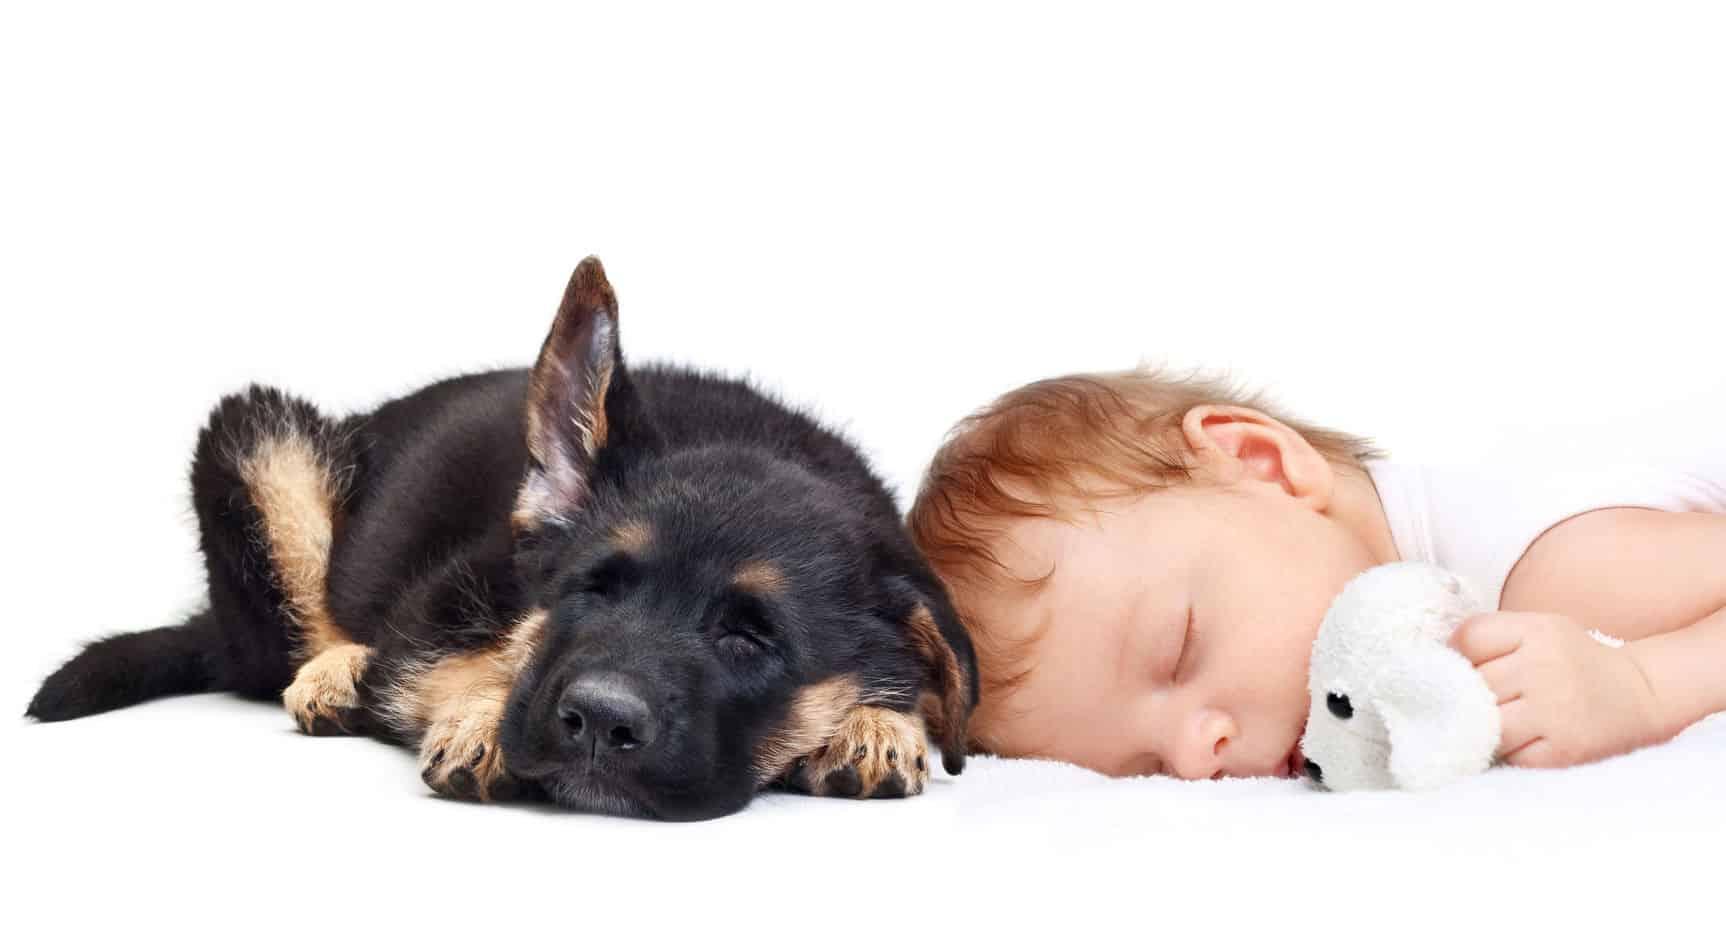 Are German Shepherd Puppies Good With Kids?